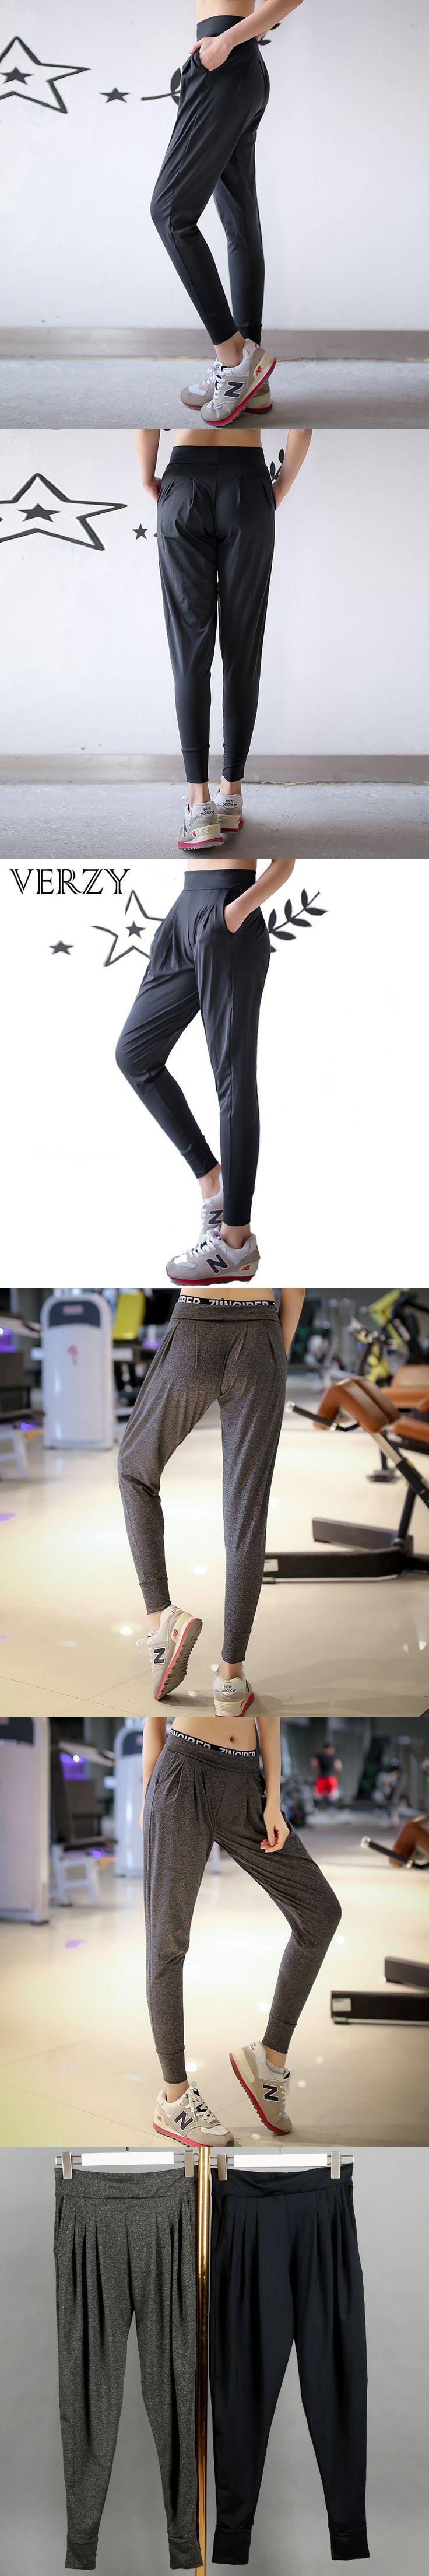 Yoga Sports Leggings For Women Sports Trousers Tight Yoga Legging High Waist Comprehension Womens Running Fitness Gym Yoga Pants